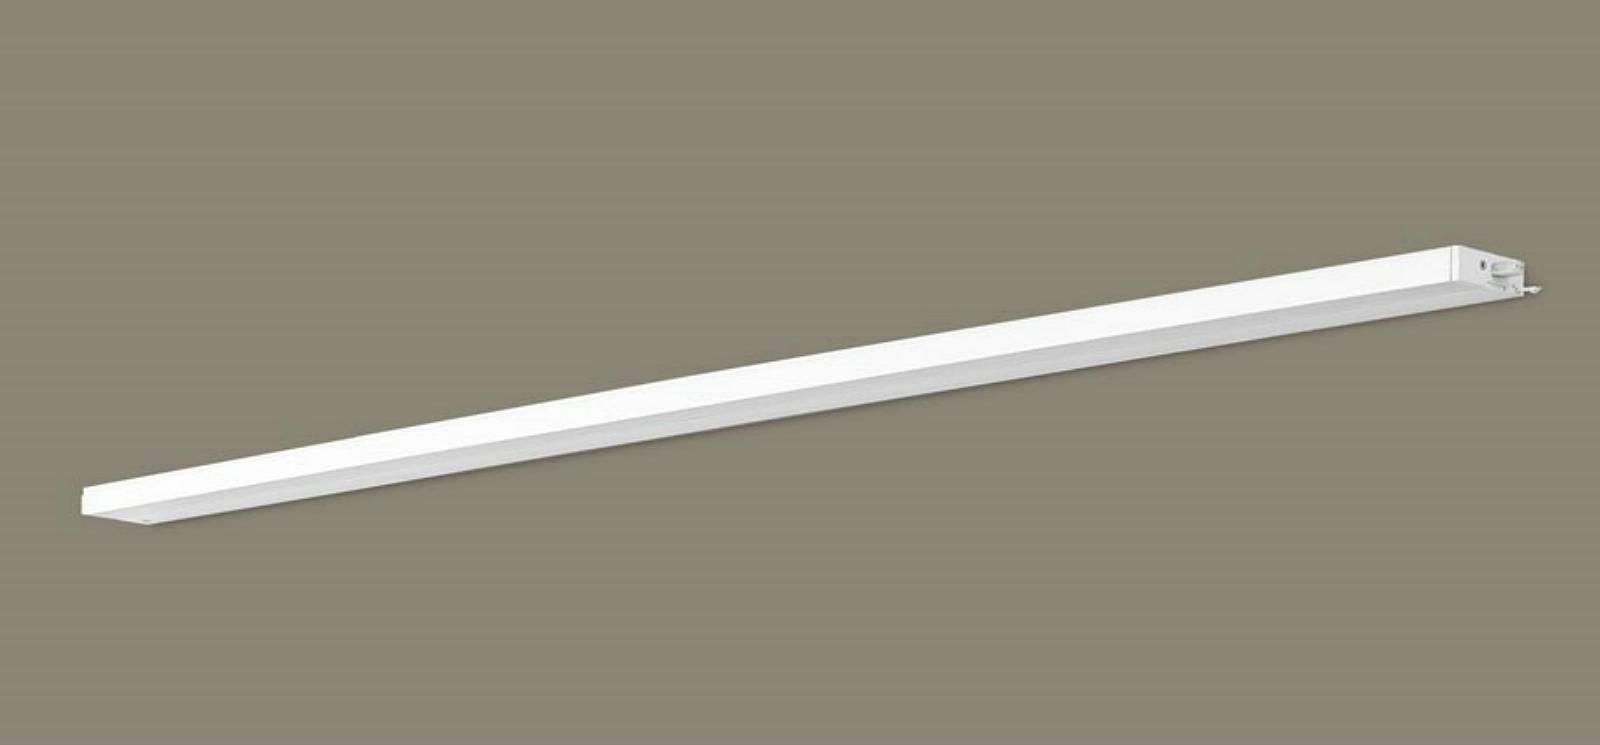 T区分 パナソニック LGB50884LE1 ベースライト 建築化照明器具 畳数設定無し LED【setsuden_led】